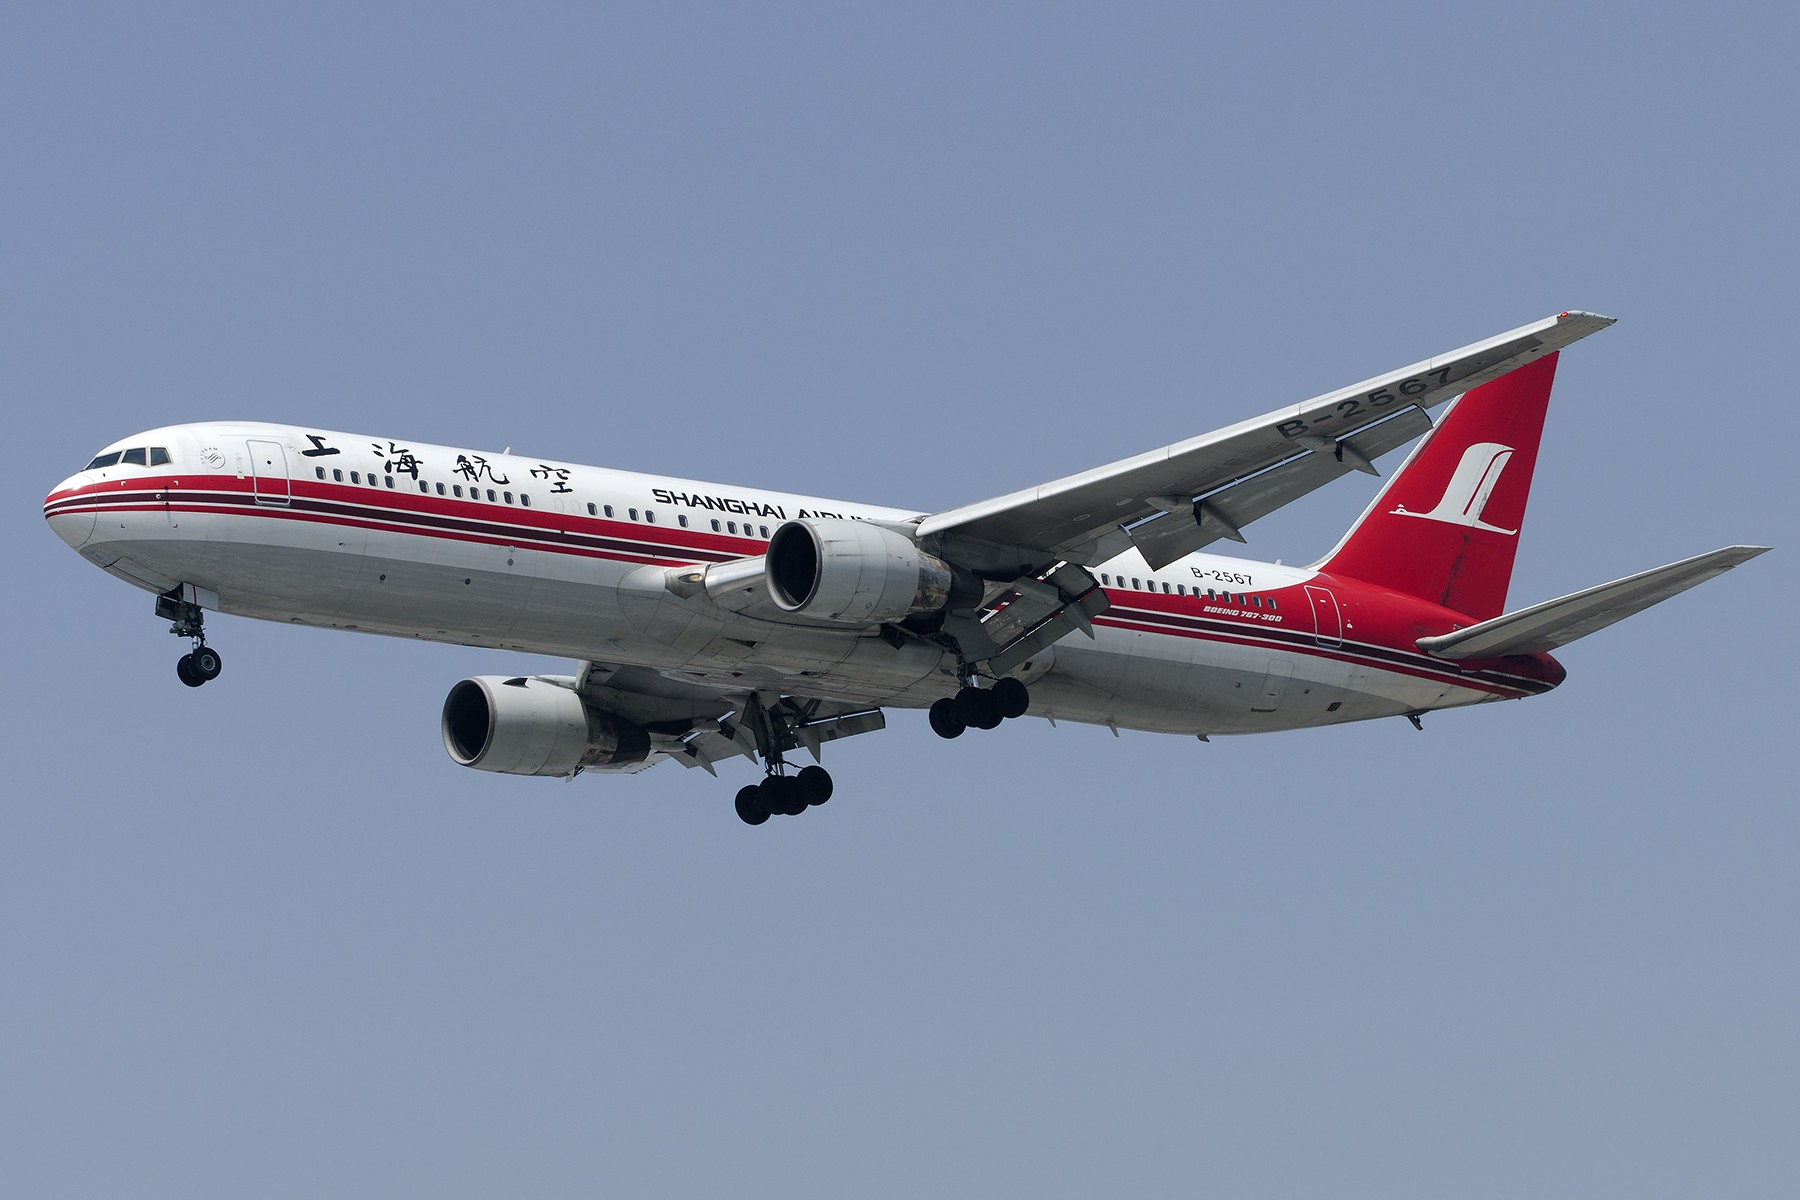 Re:[原创][原创]【SHA拍机*1800大图】4月拍的了,记得那天好货还挺多 BOEING 767-300 B-2567 中国上海虹桥国际机场